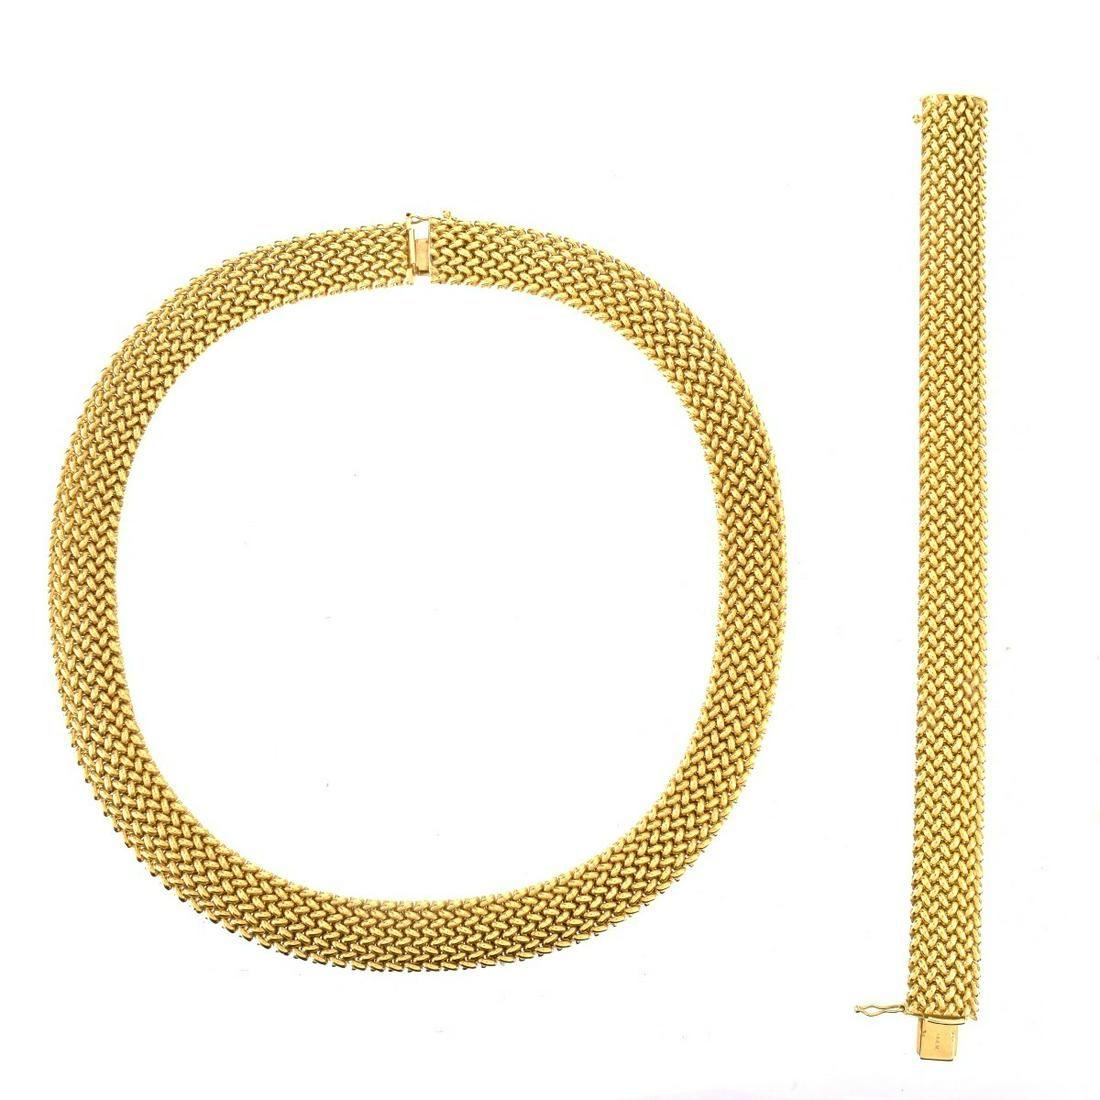 Vintage 14K Necklace and Bracelet